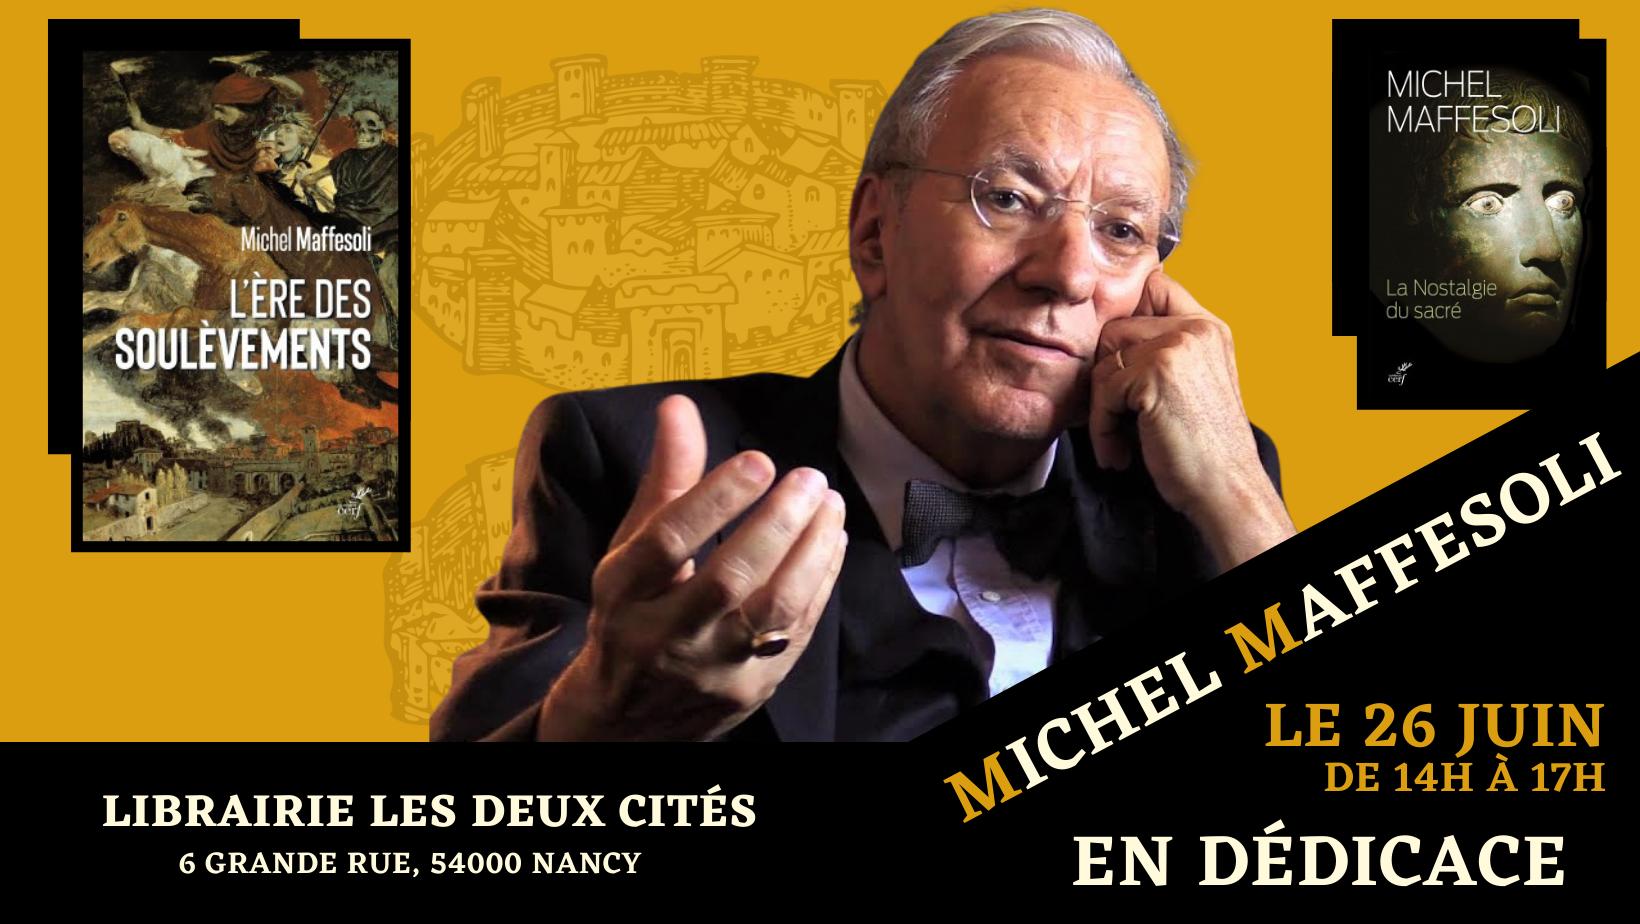 Michel Maffesoli en dédicace le 26 juin 2021